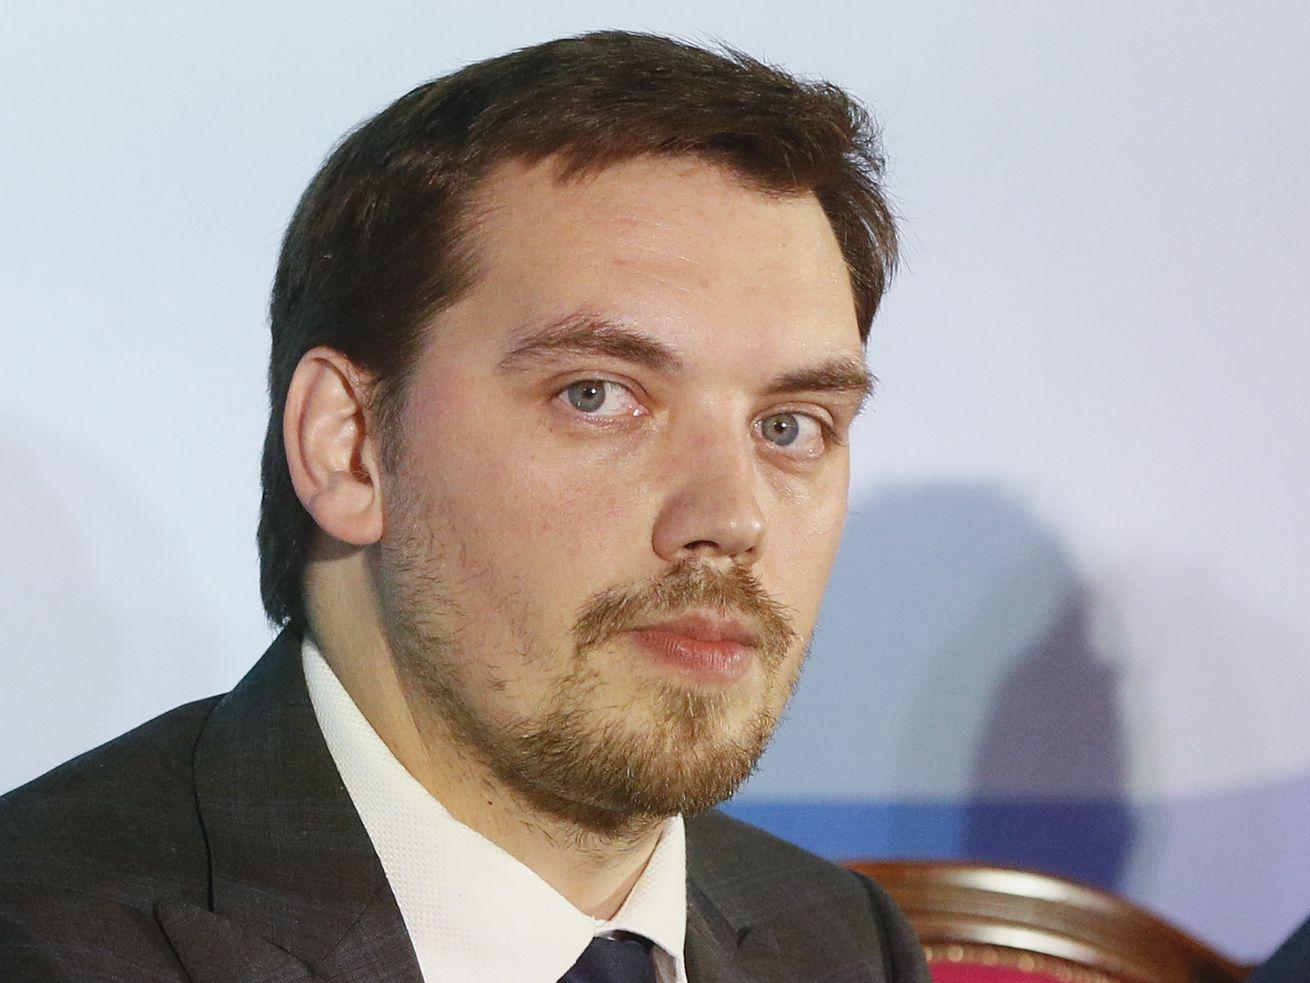 Ukrainian prime minister submits resignation after criticism of President Zelenskiy is leaked